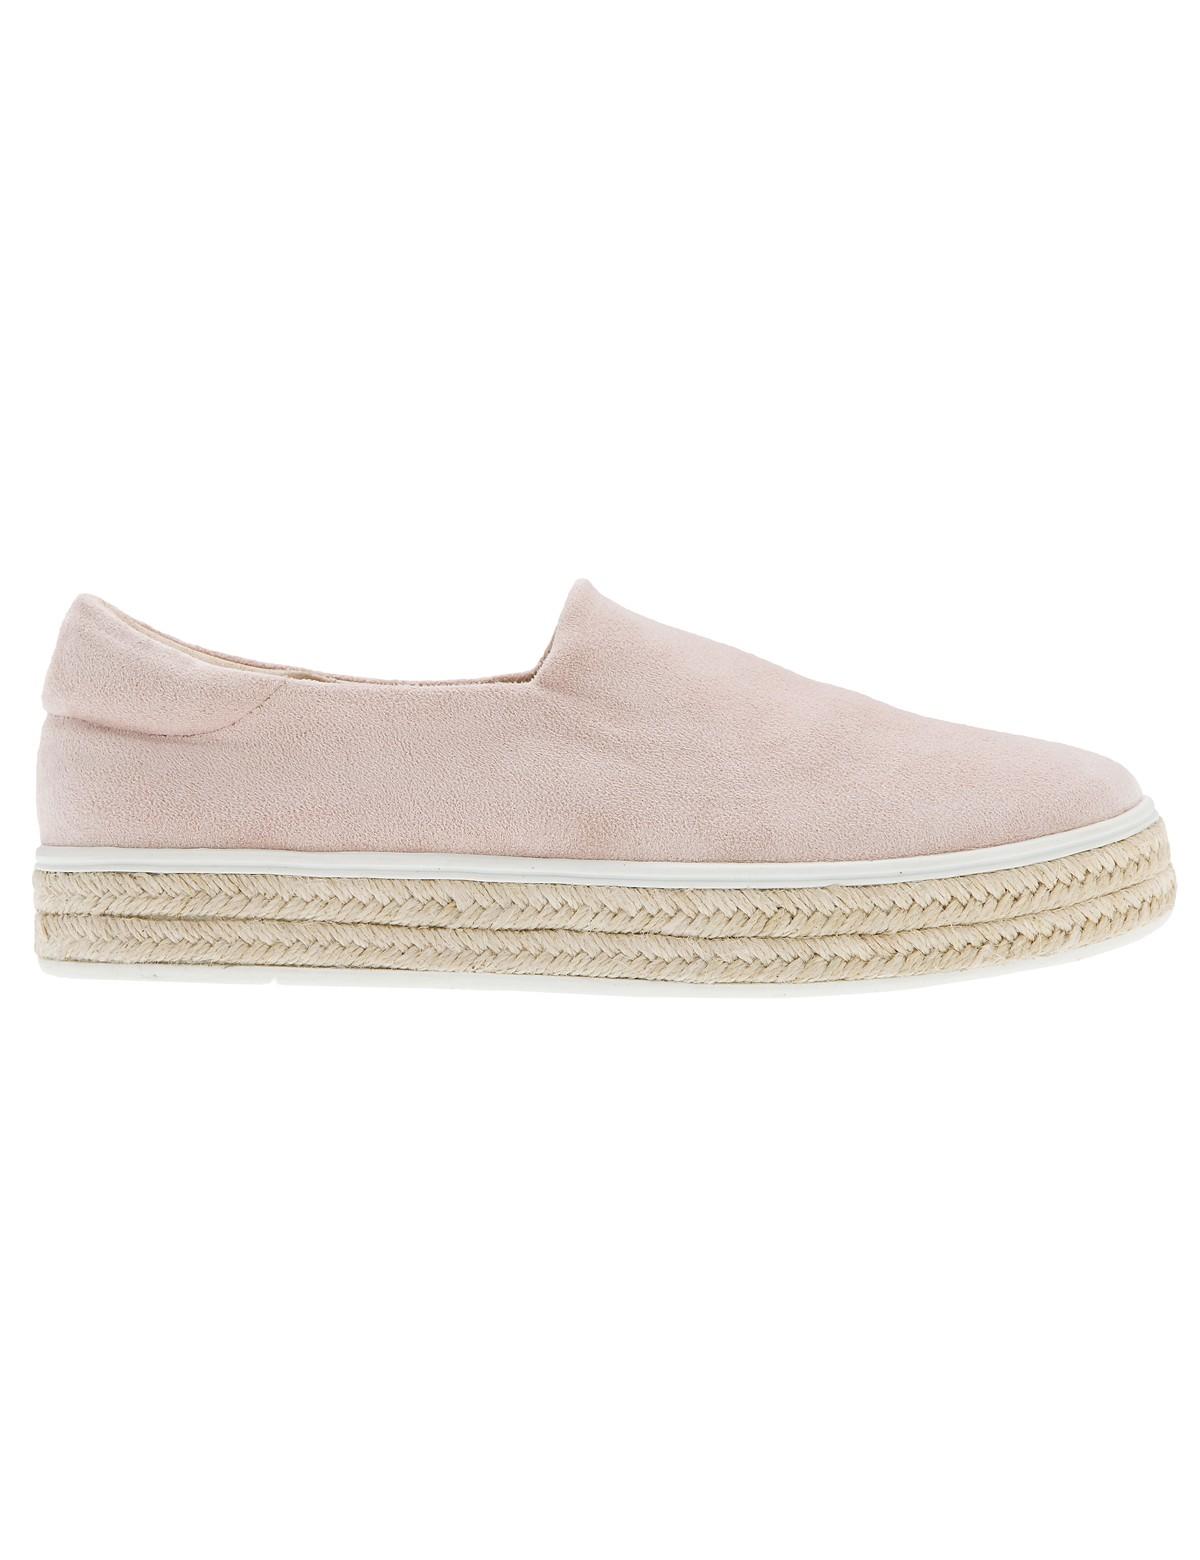 spo 800 pink sneakers 3 a867e